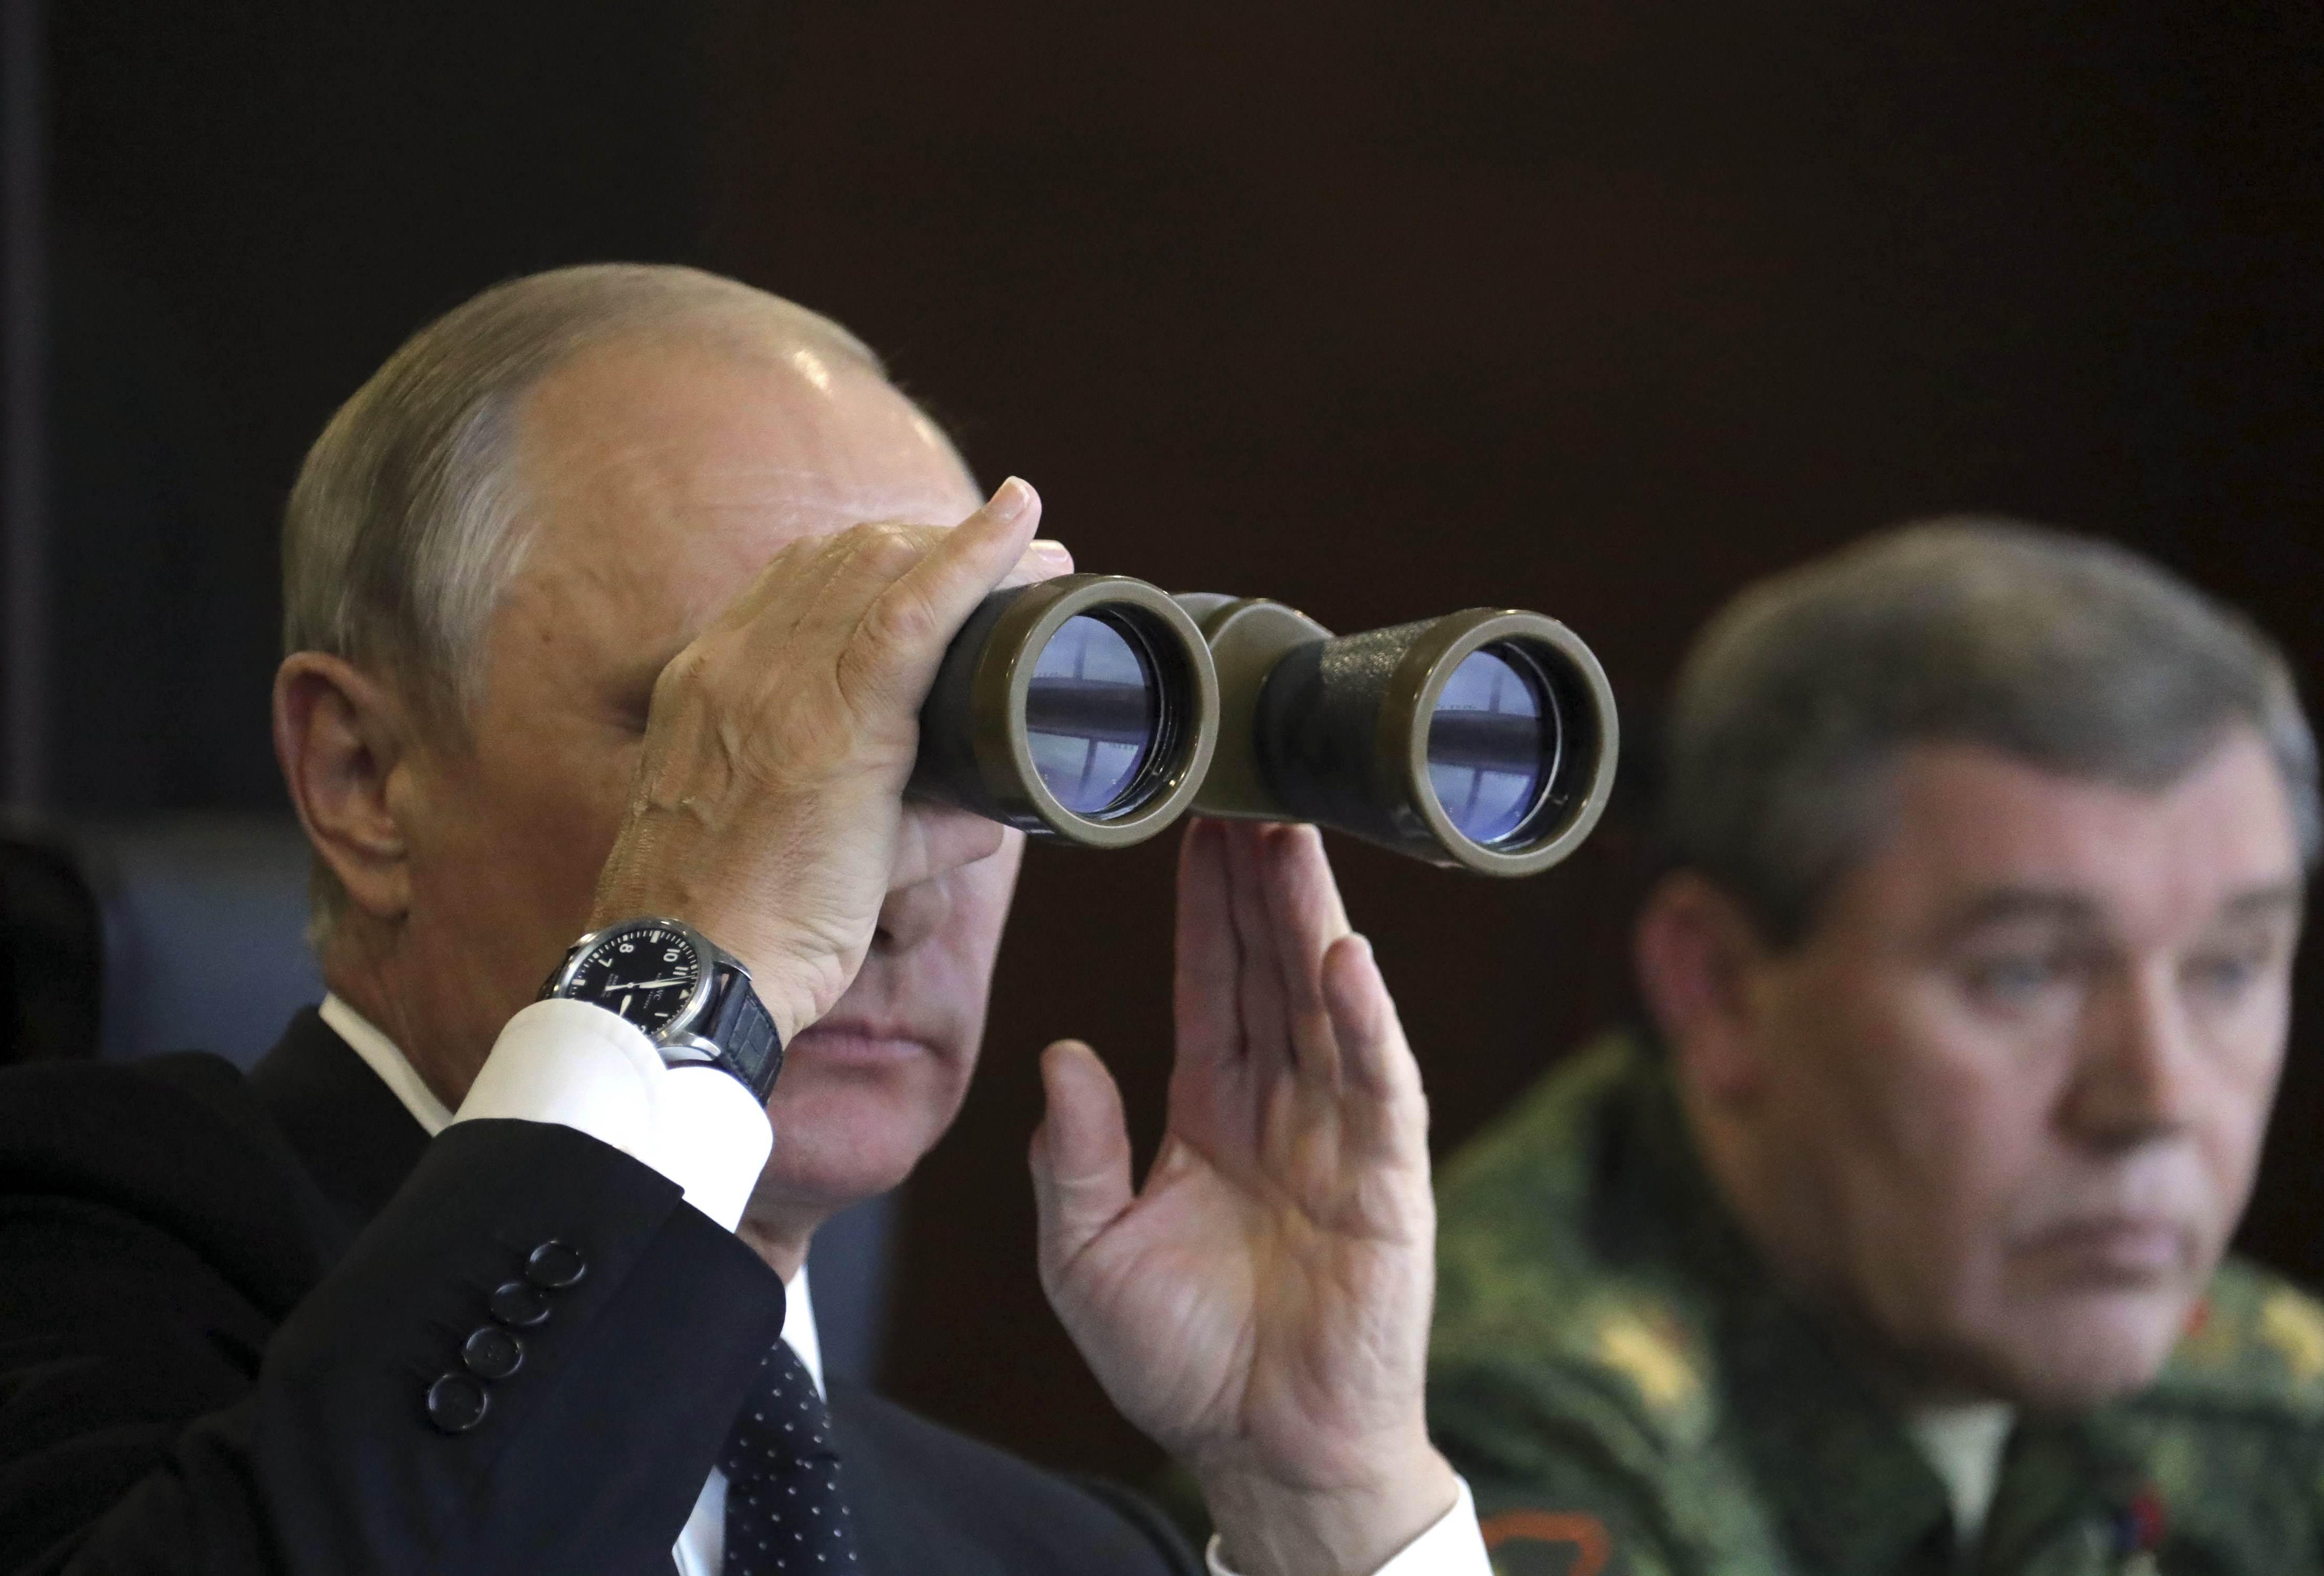 Vladimir Putin observa los ejercicios militares Zapad 2017 junto al general Valery Gerasimov en Leningrado (Sputnik/Mikhail Klimentyev/Kremlin/Reuters)